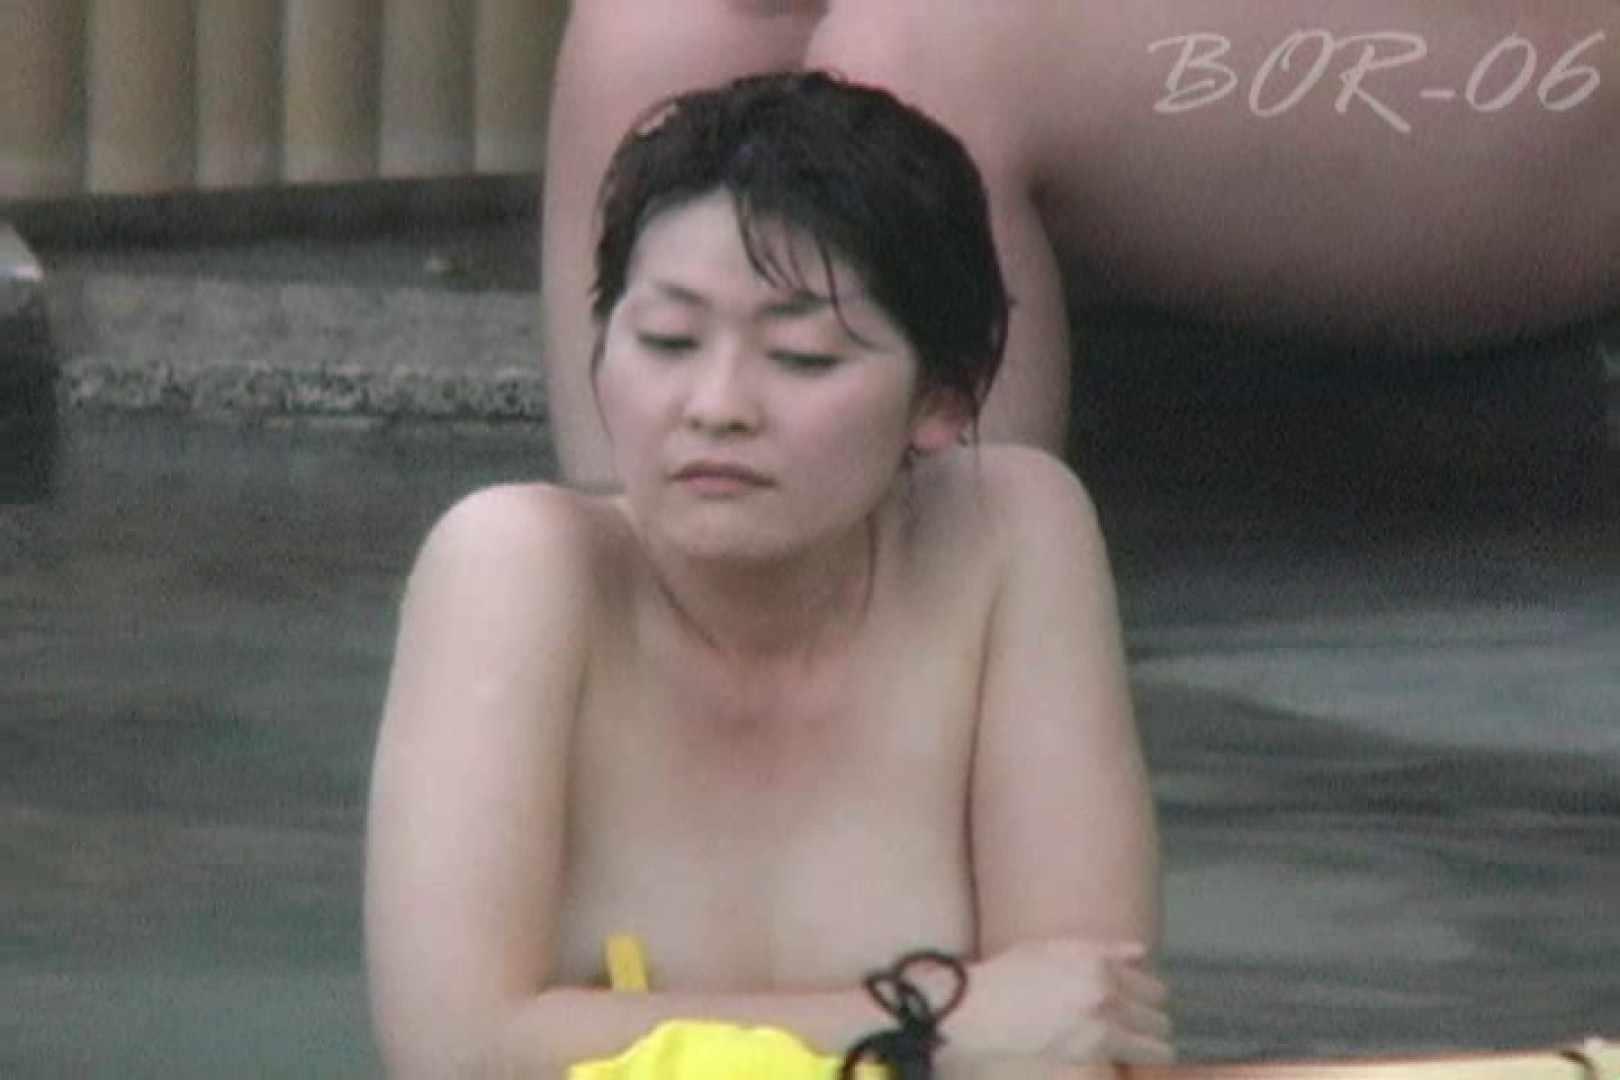 Aquaな露天風呂Vol.523 盗撮映像  93Pix 25